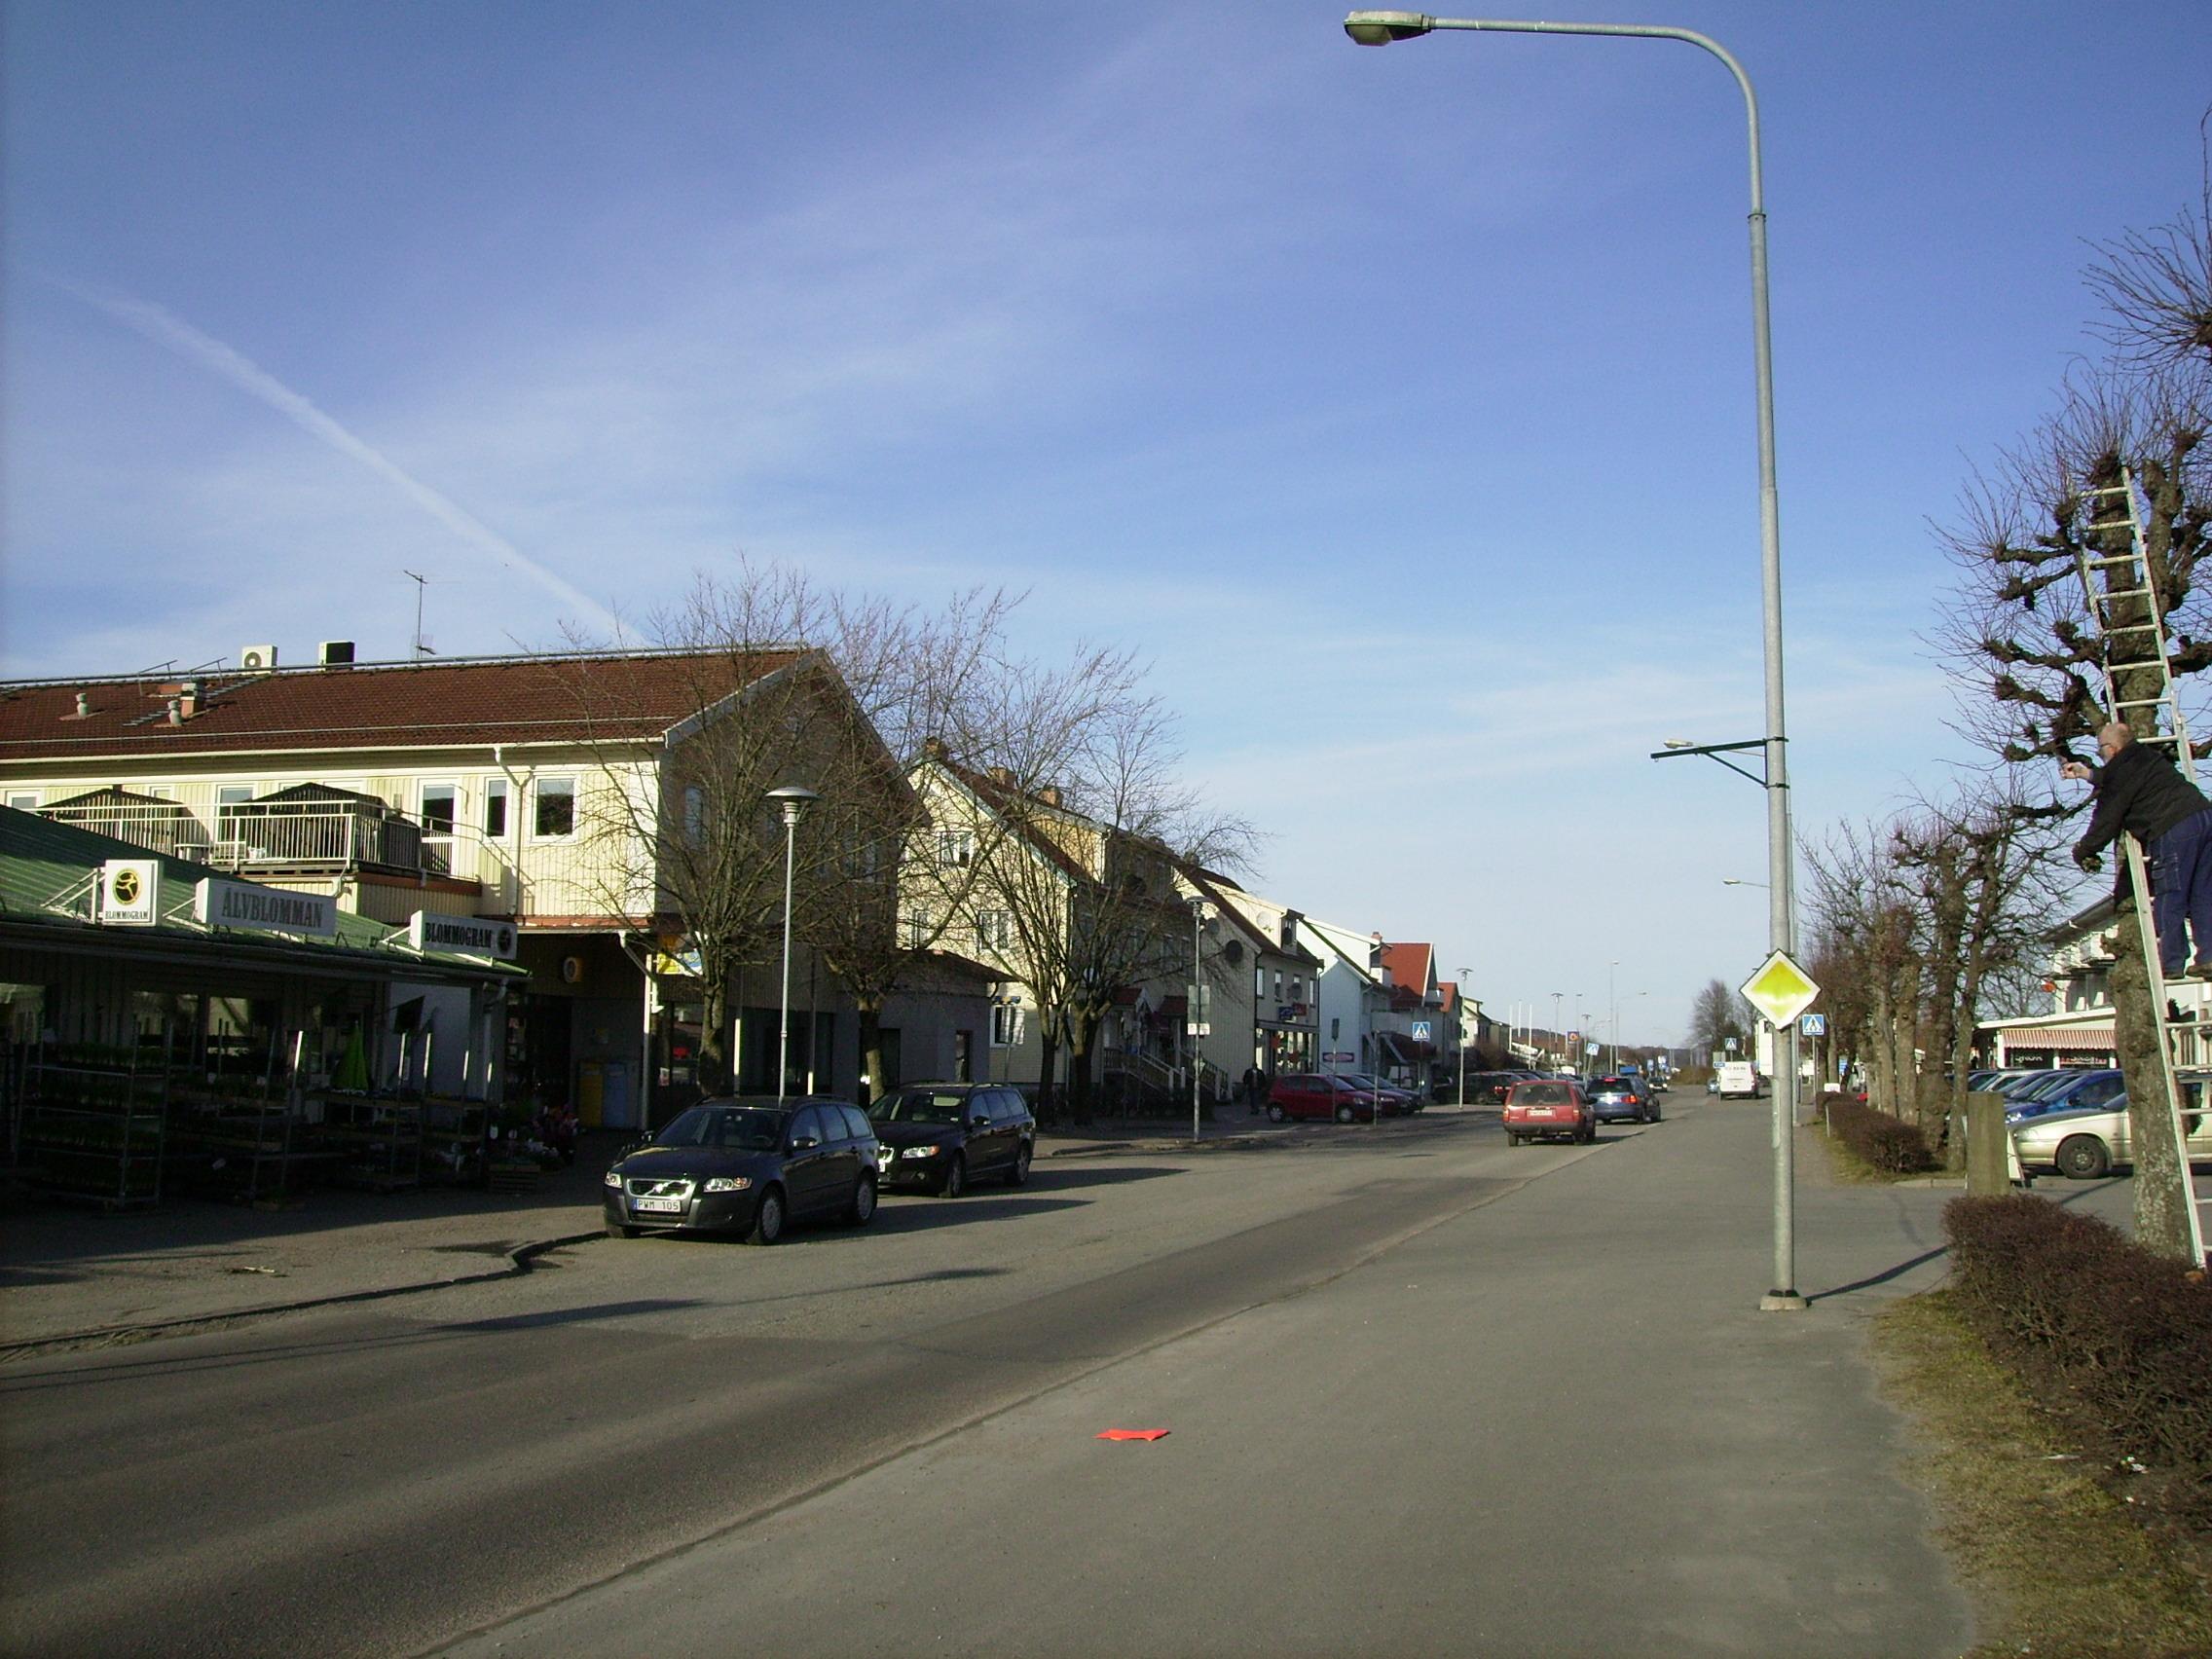 Svenstorp 160 Vstra Gtalands Ln, lvngen - unam.net